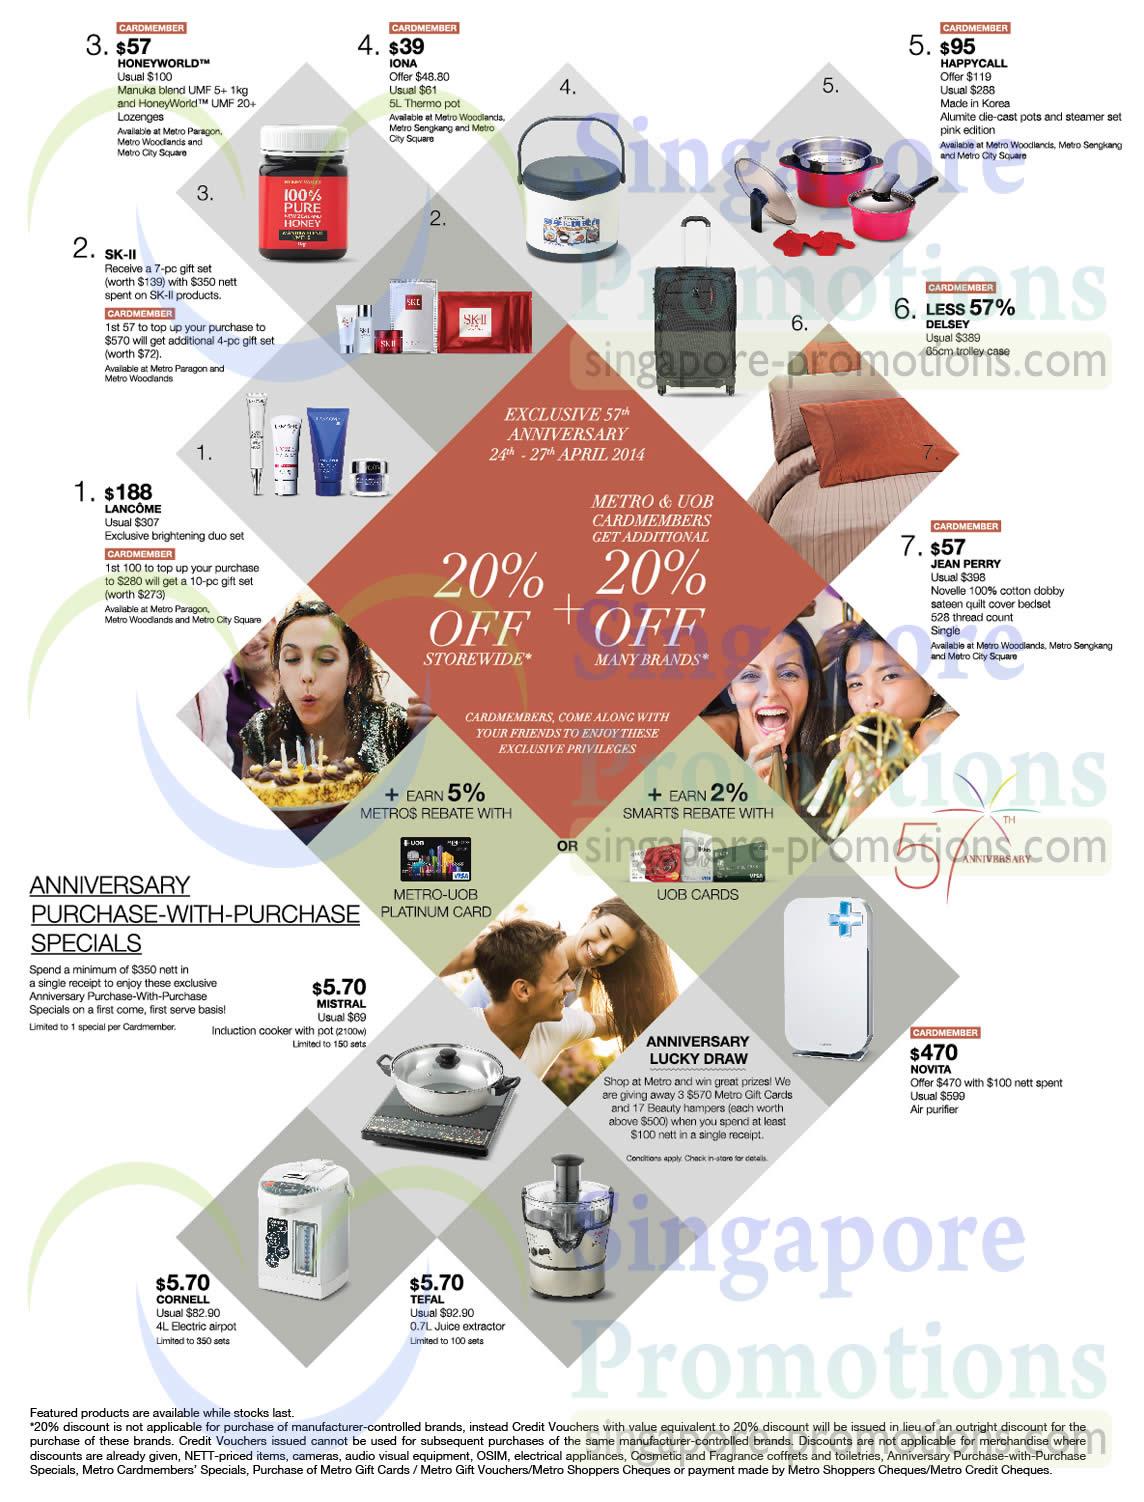 Kitchenware, Perfumes, Health Supplements, Honeyworld, Happycall, Jean Perry, Lancome, SK-II, Novita, Cornell, Tefal